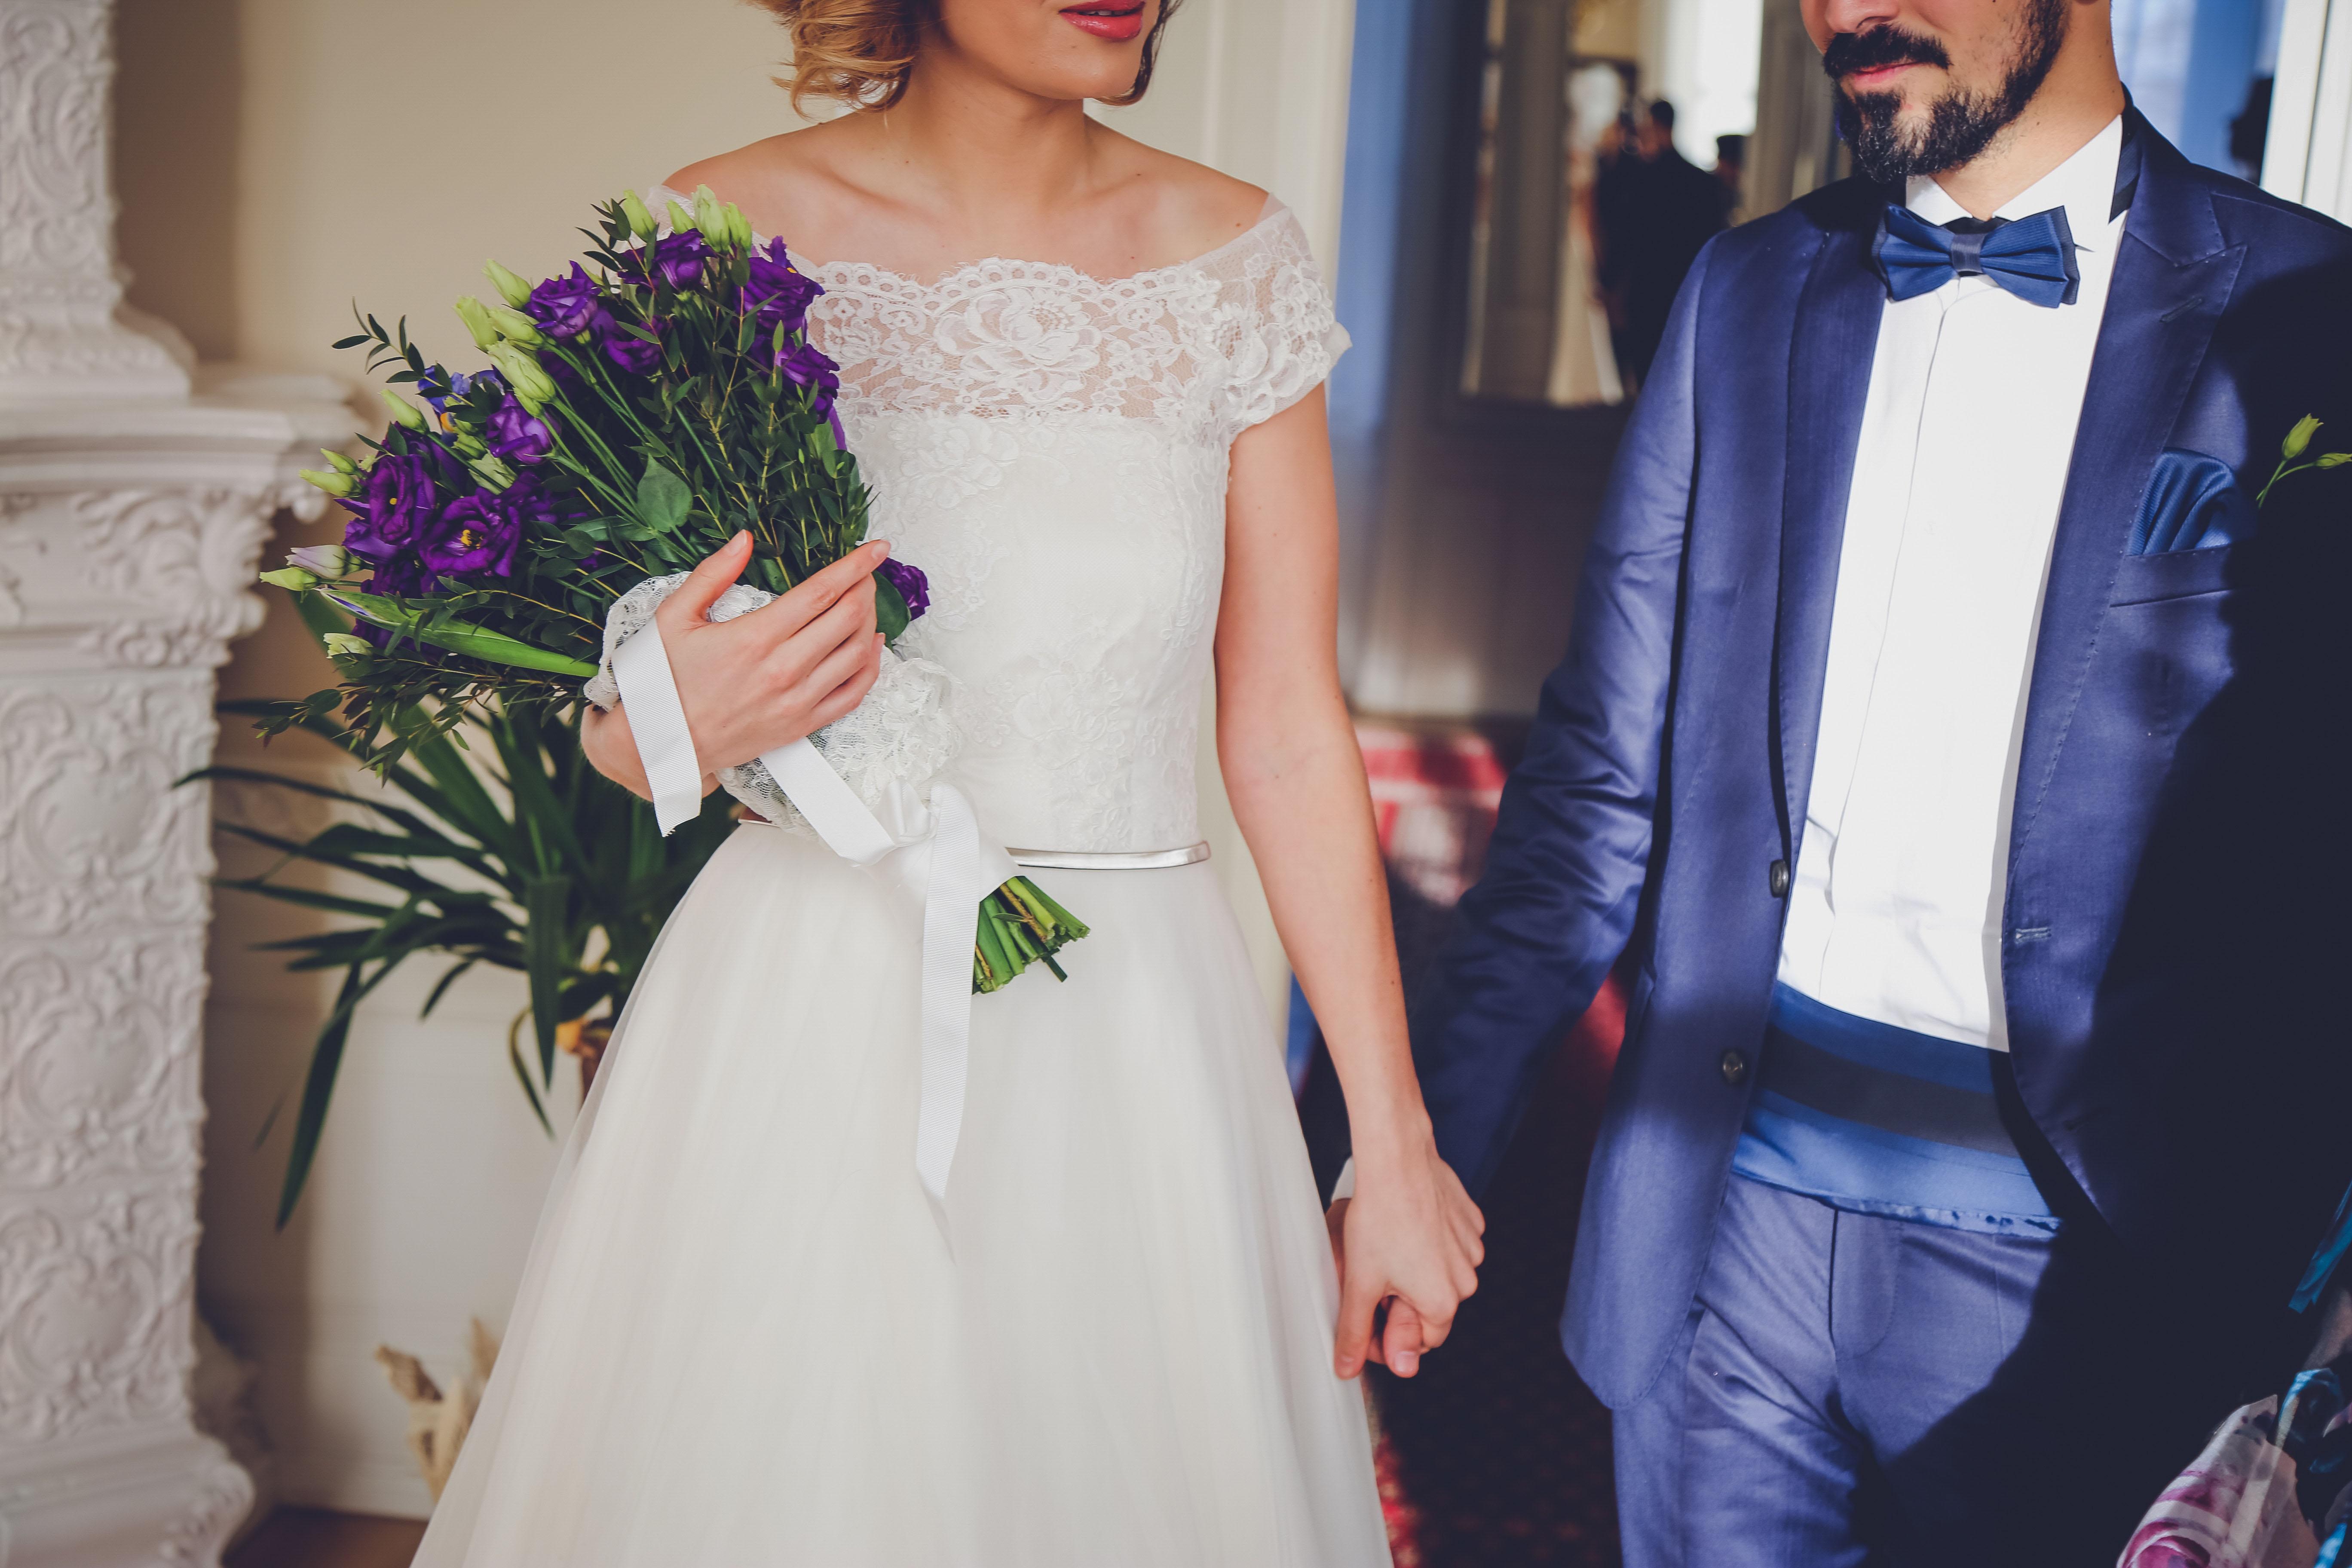 candid wedding photography guide - photojaanic -21